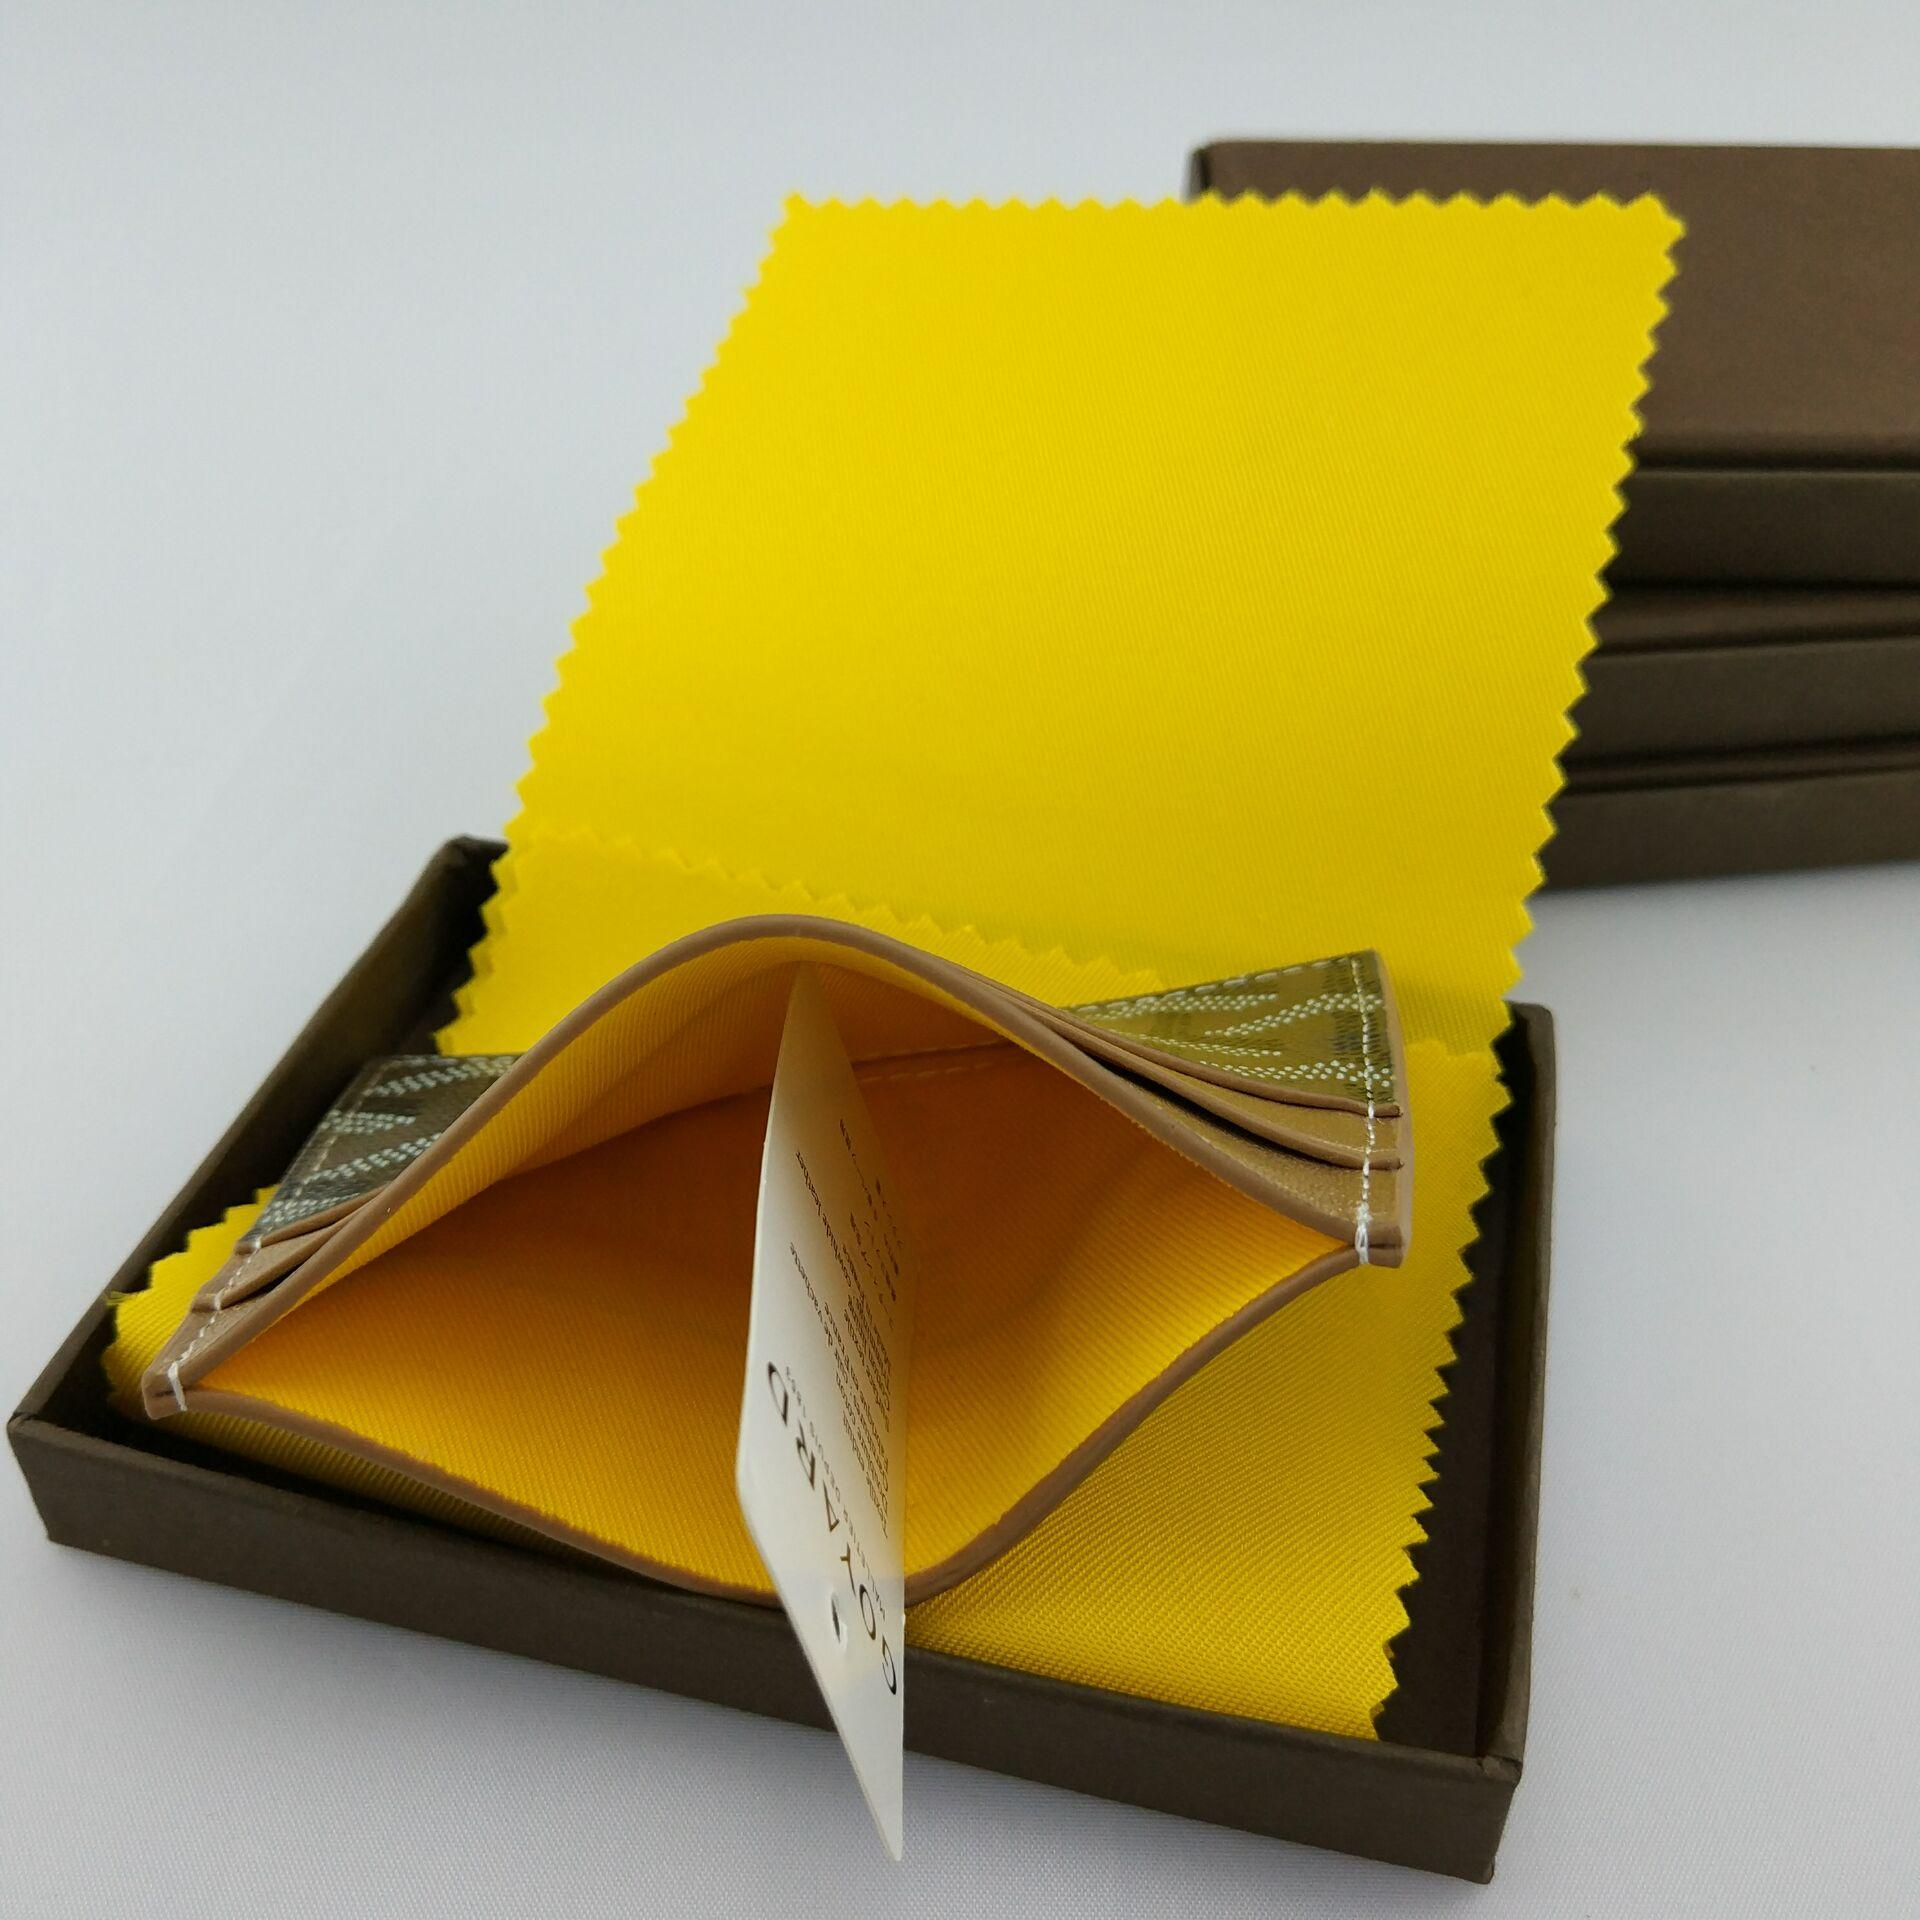 Commercio all'ingrosso Classic Design Casual carta di credito in pelle set carta pacchetto marea francese Carta ID Holder Ultra Slim Wallet Packet gy Bag con scatola